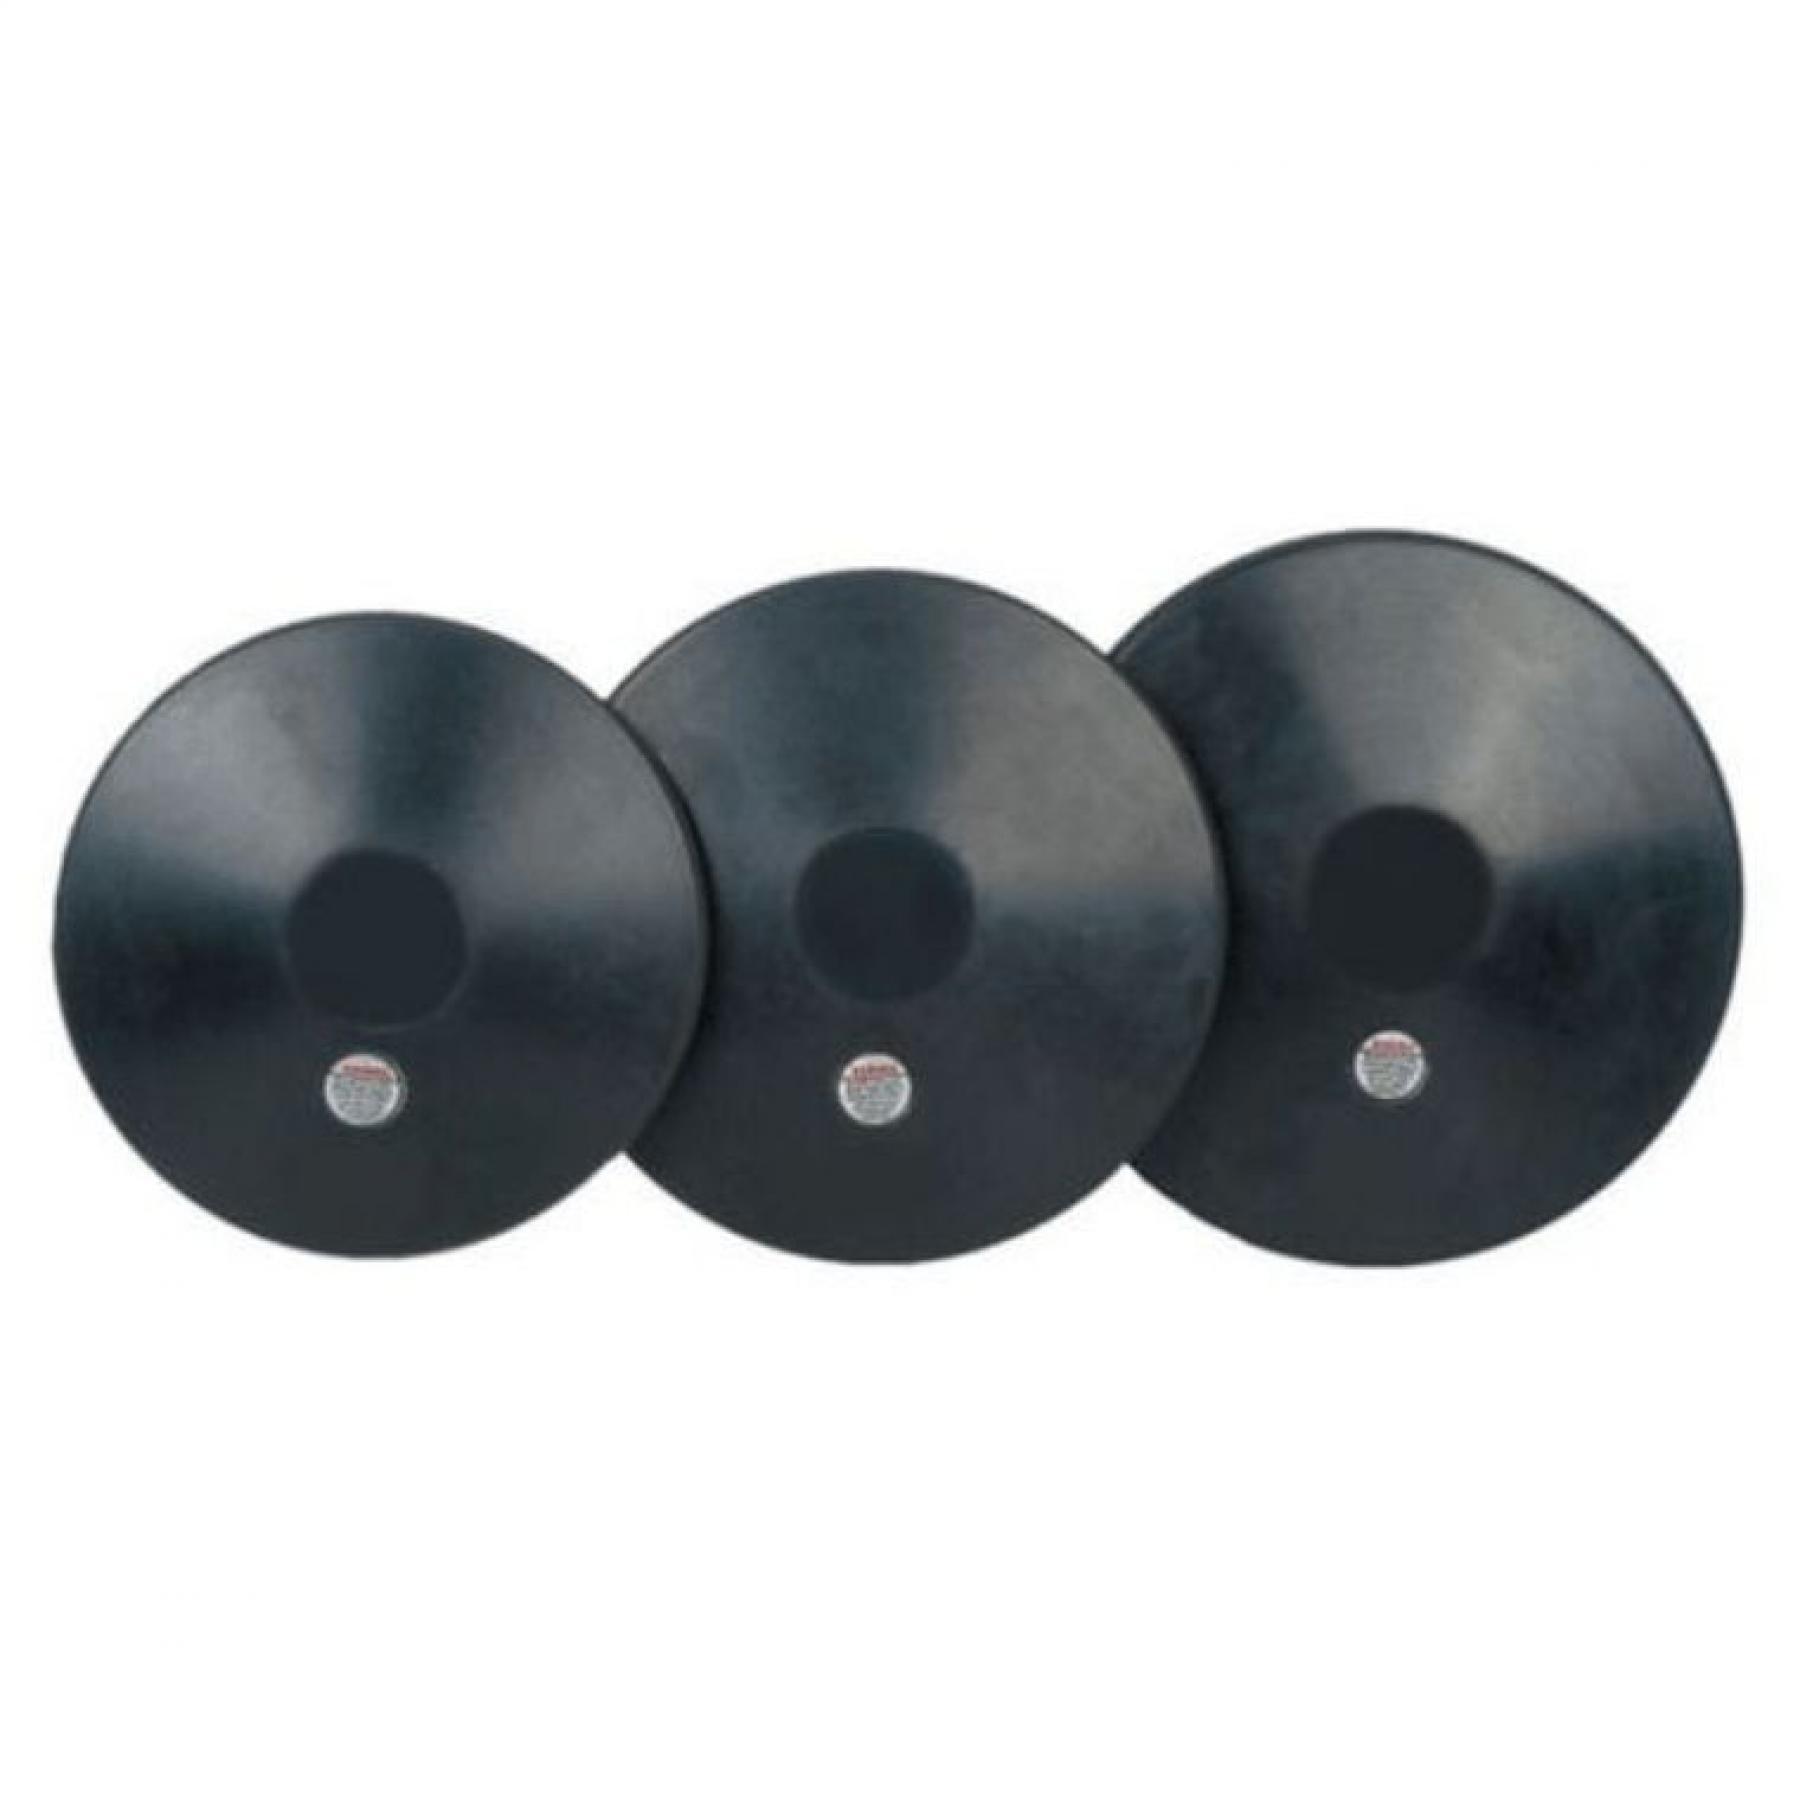 Discus Rubber 1.5kg